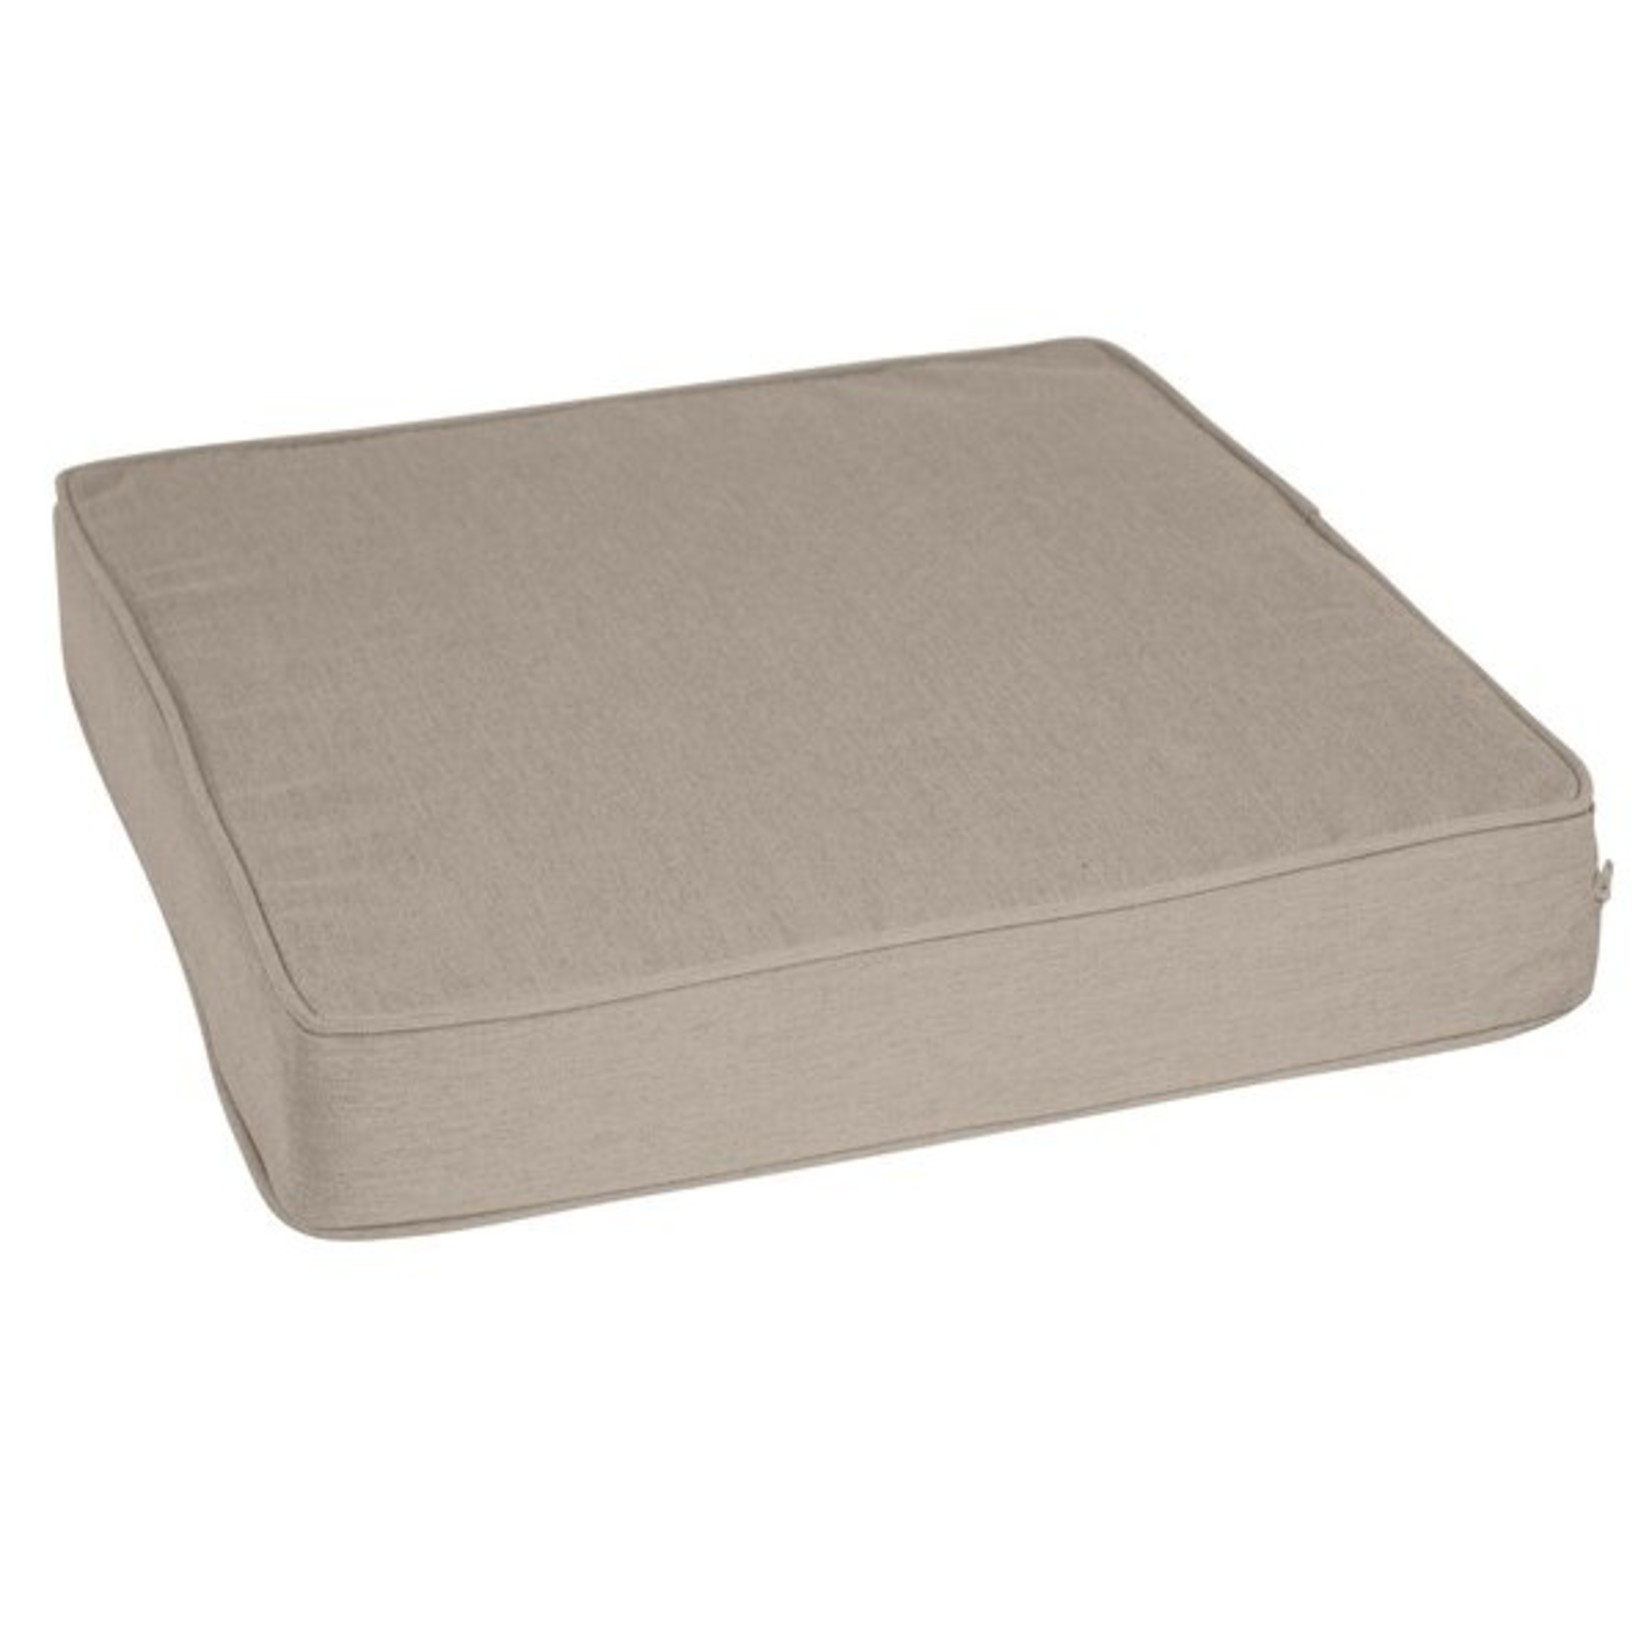 *Outdoor Sunbrella Seat Cushion - Cast Ash - Set of 2